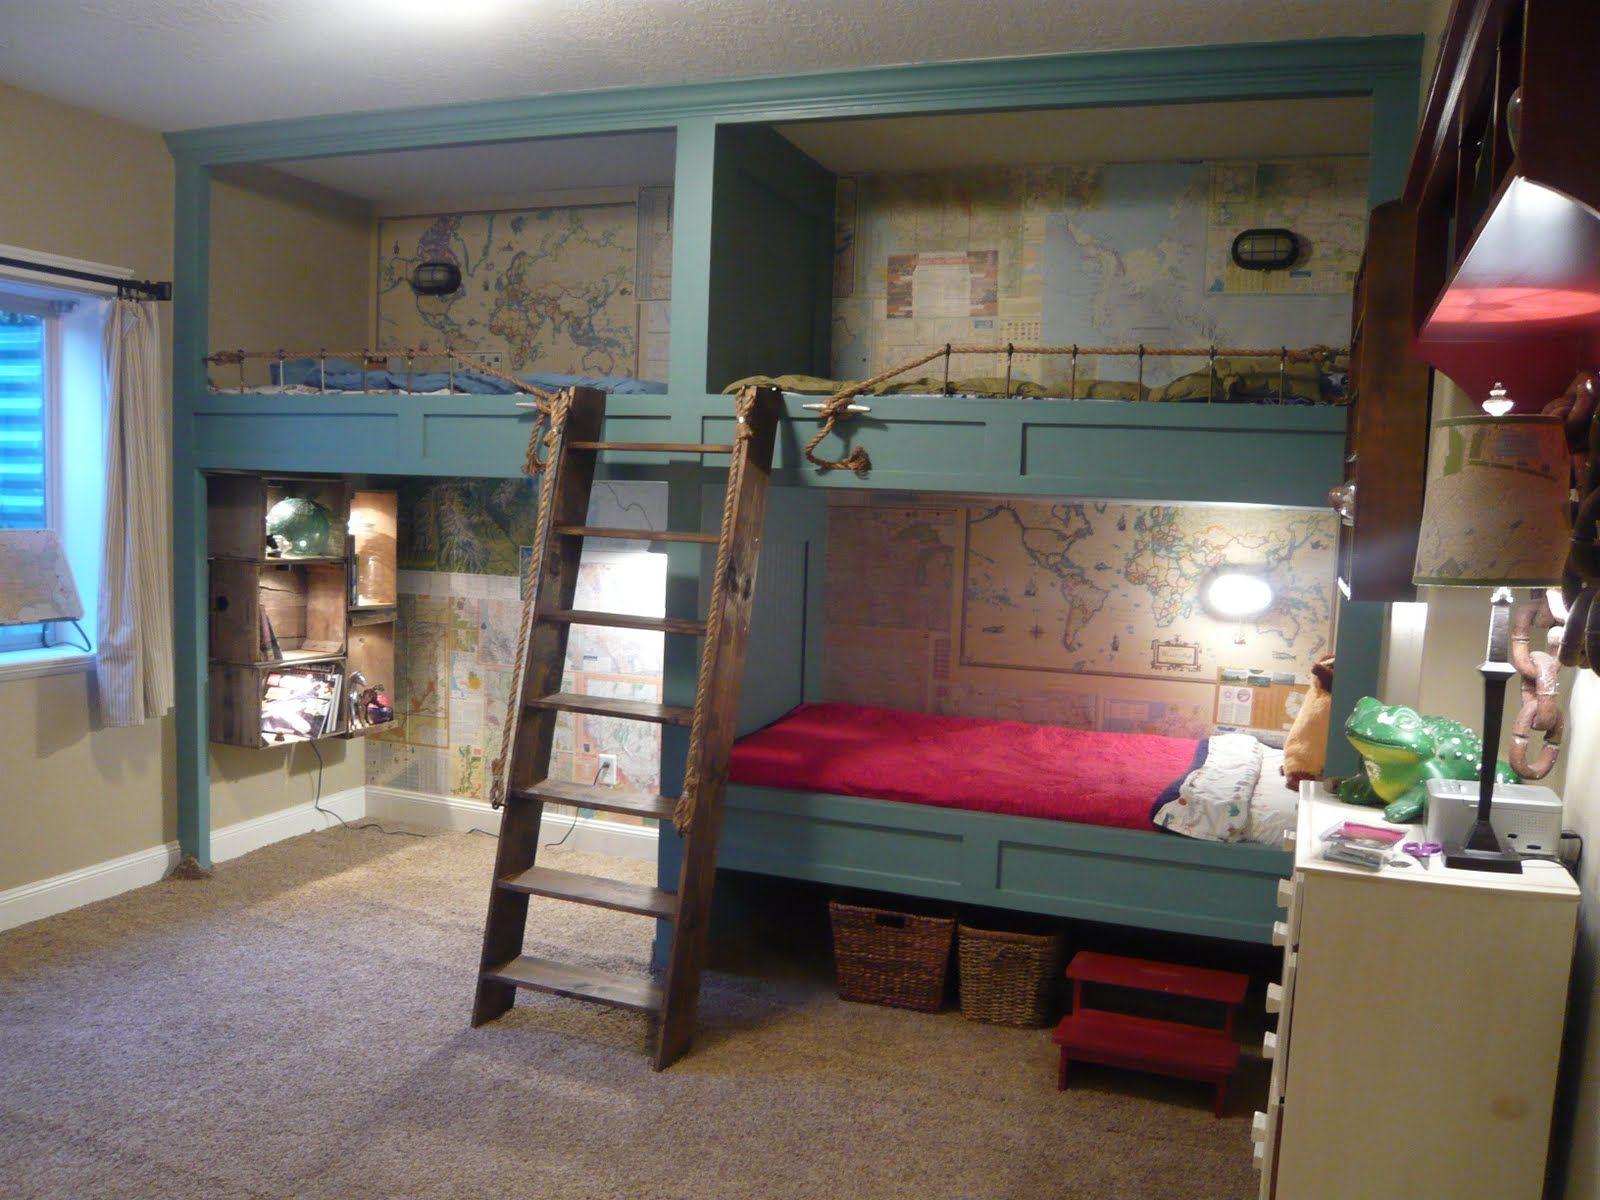 Loft bed boy room ideas  Coolest Bunk Beds Design Ideas  Coolest Bunk Beds Based With Map